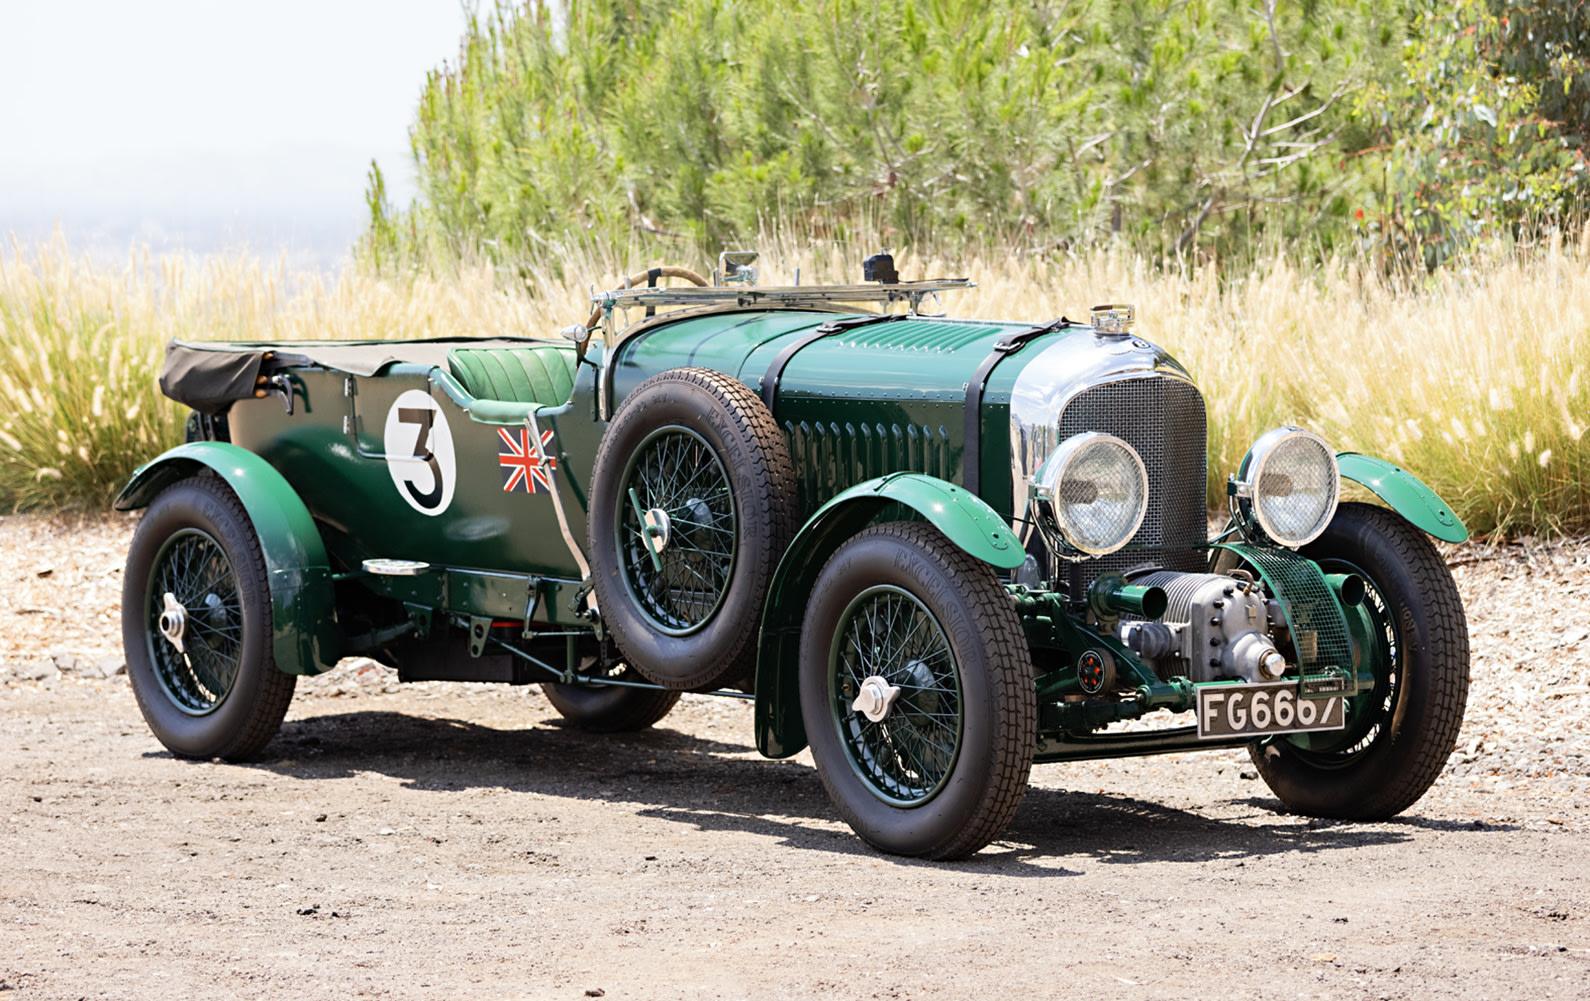 1931 Bentley 4 1/2 Litre Supercharged 'Blower' Sports Tourer